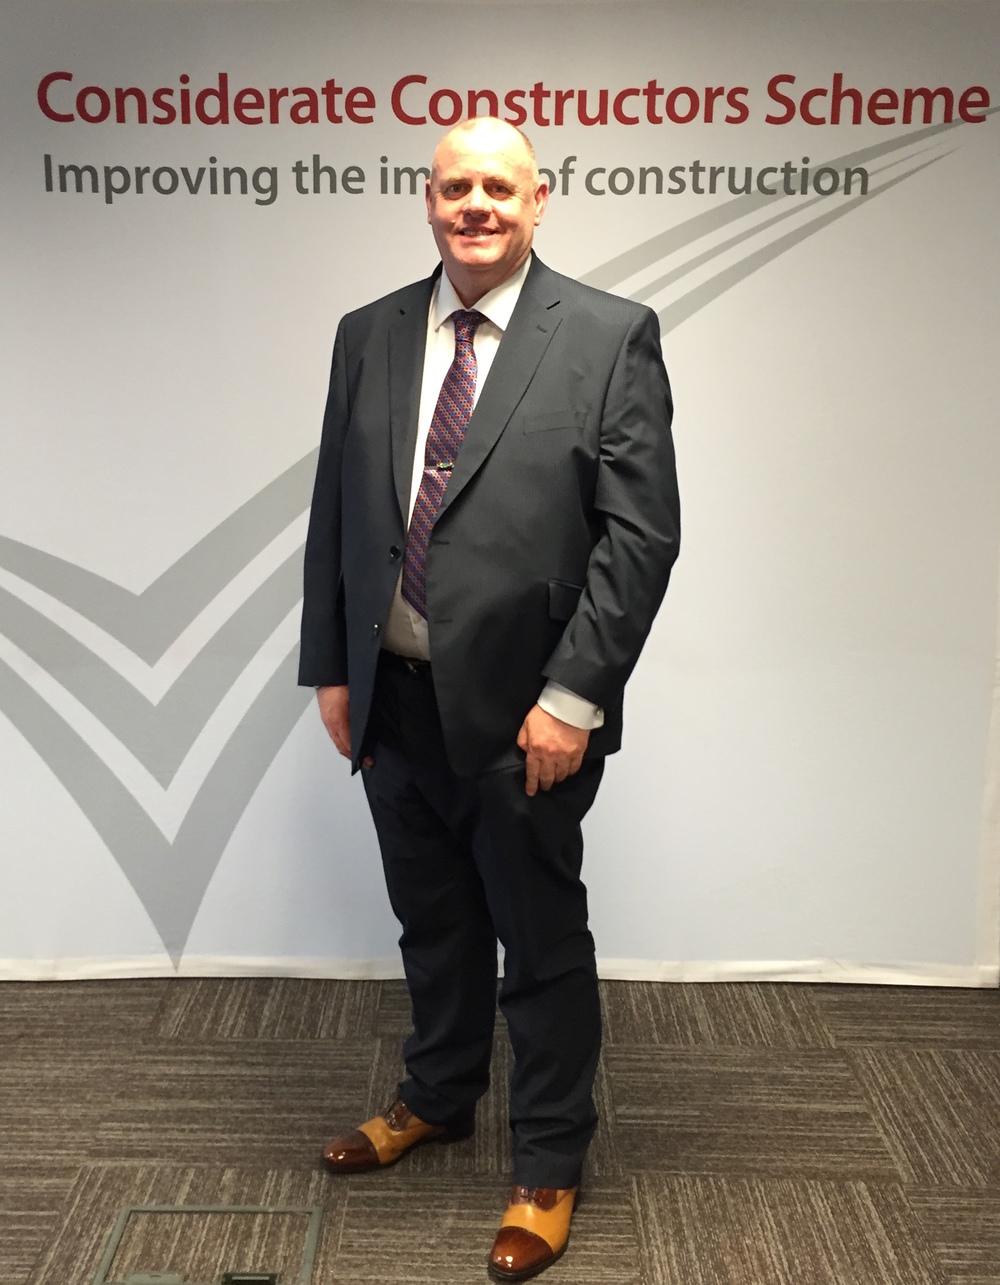 John Knott Considerate Constructors Award Winner